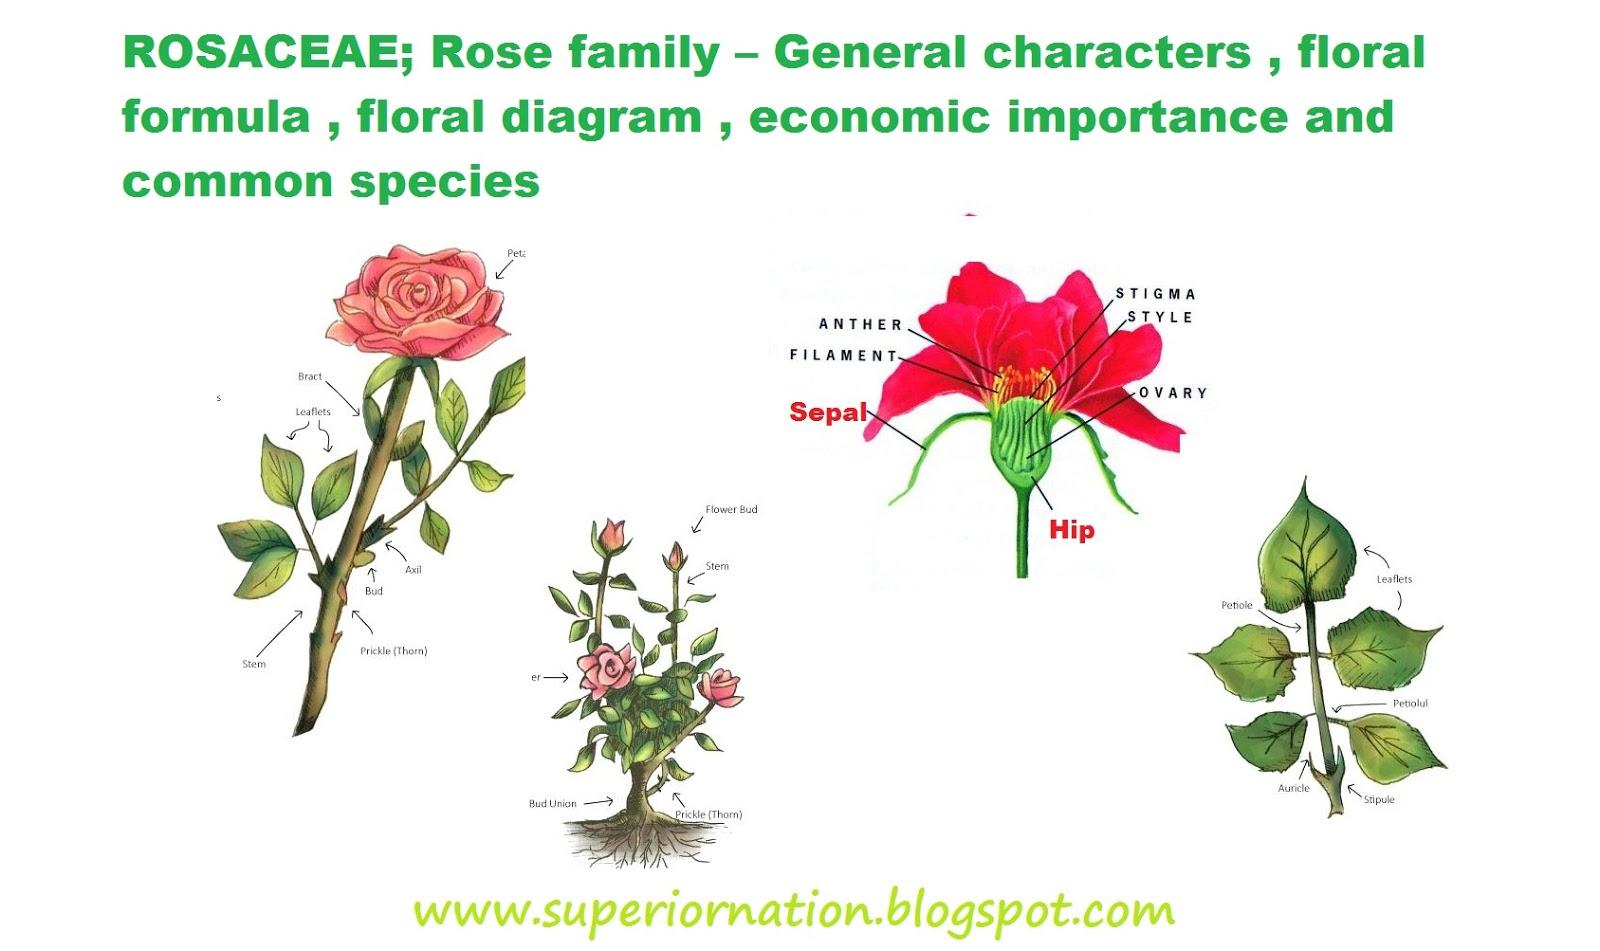 rosaceae rose family general characters floral formula floral diagram economic importance [ 1600 x 951 Pixel ]